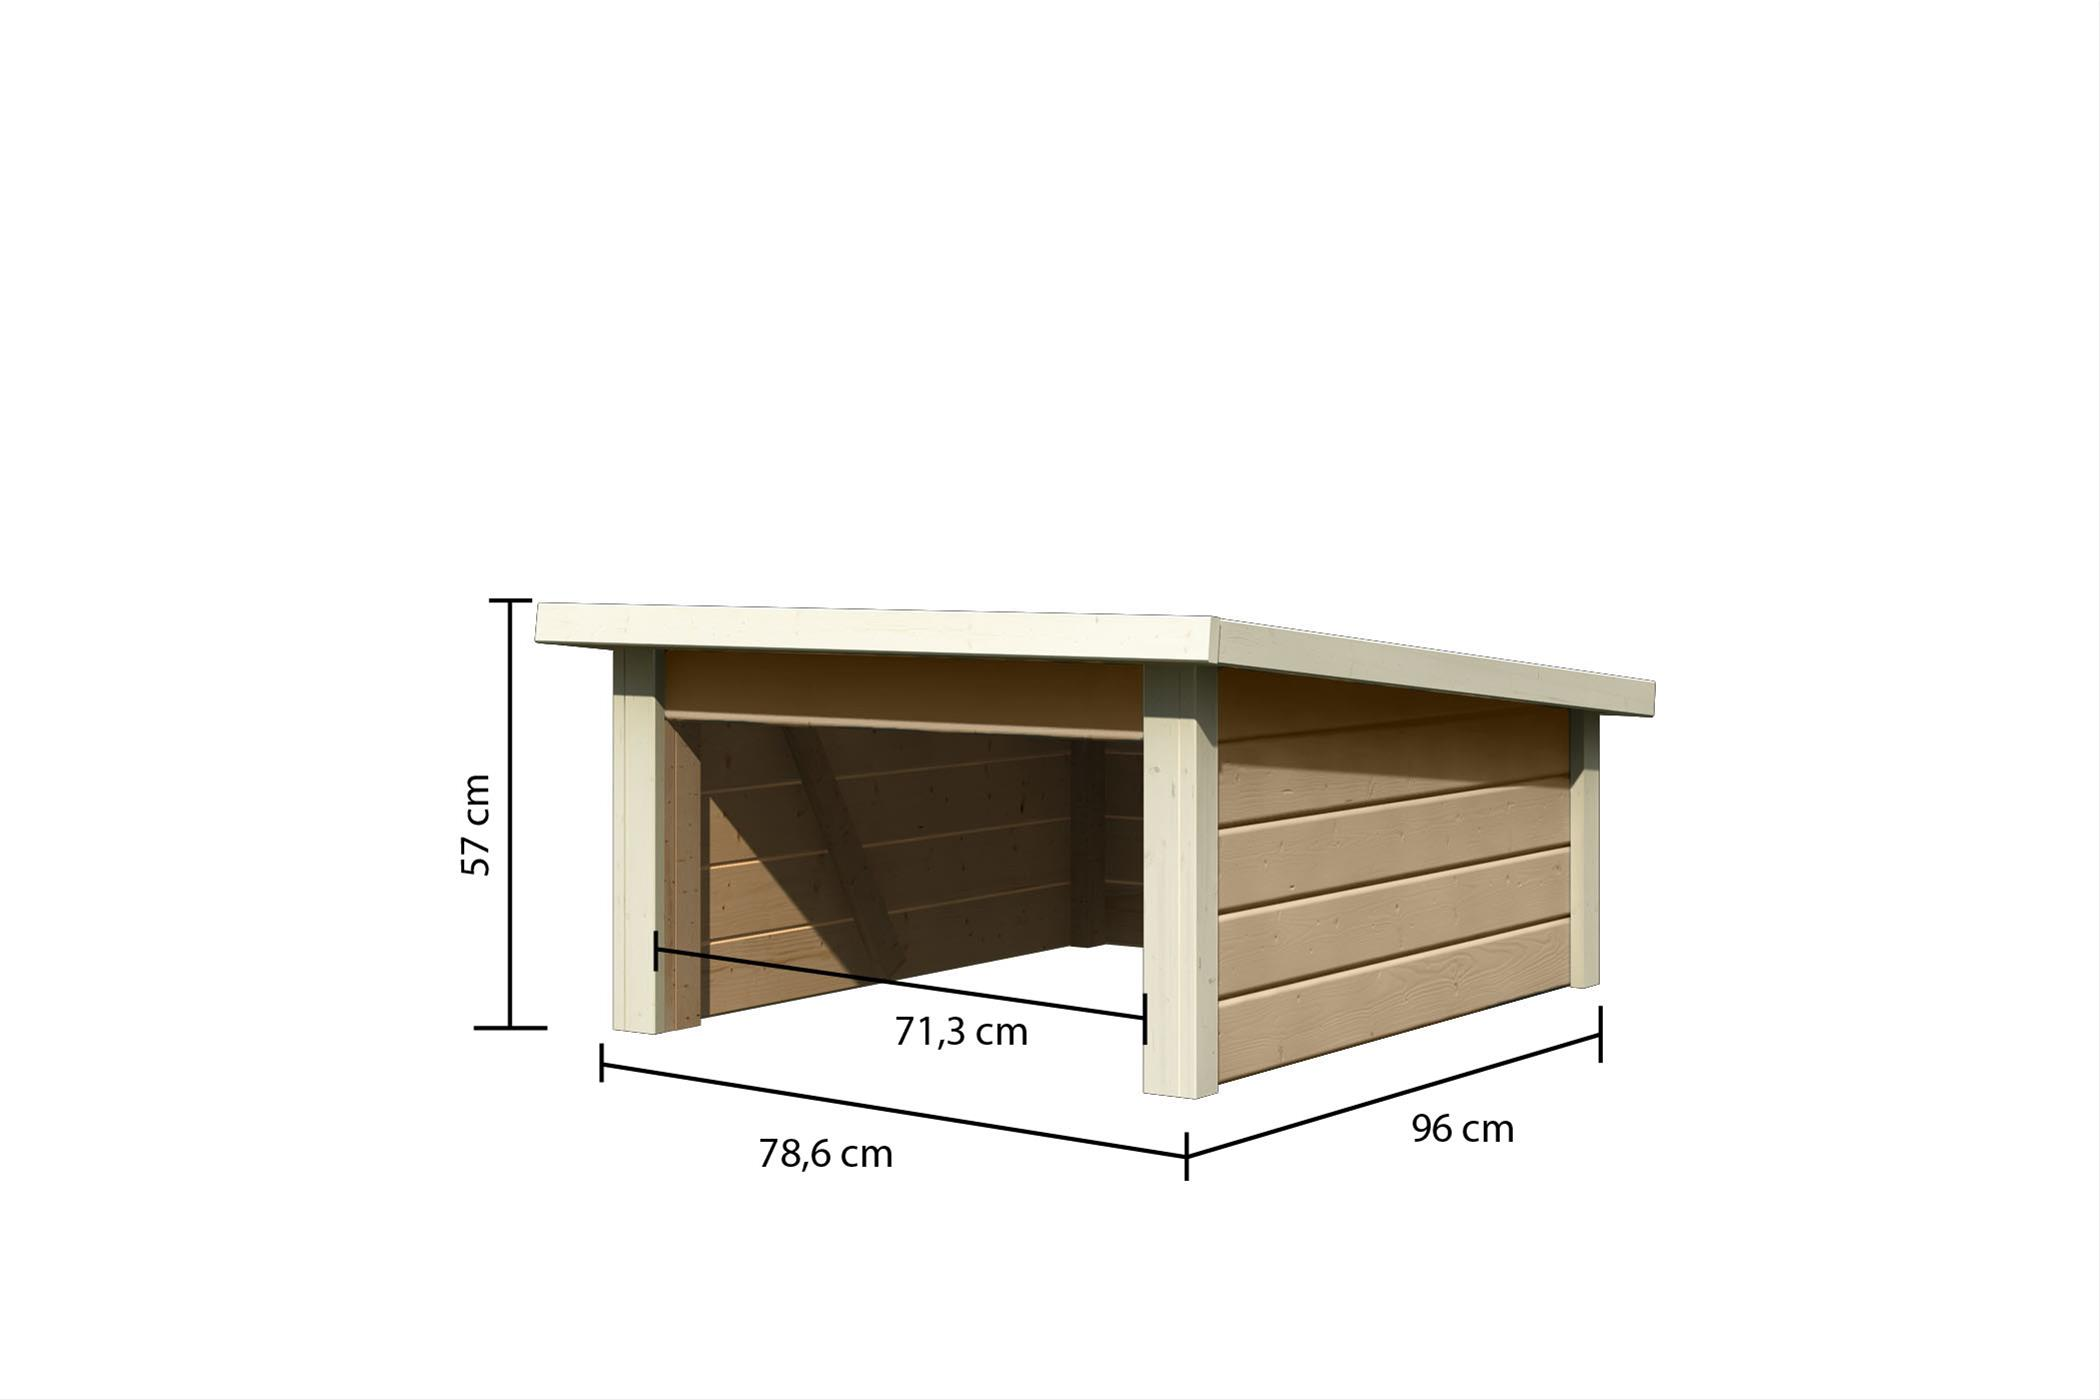 Woodfeeling Mähroboter Haus / Garage 2 sandbeige 79x96x57cm Bild 3